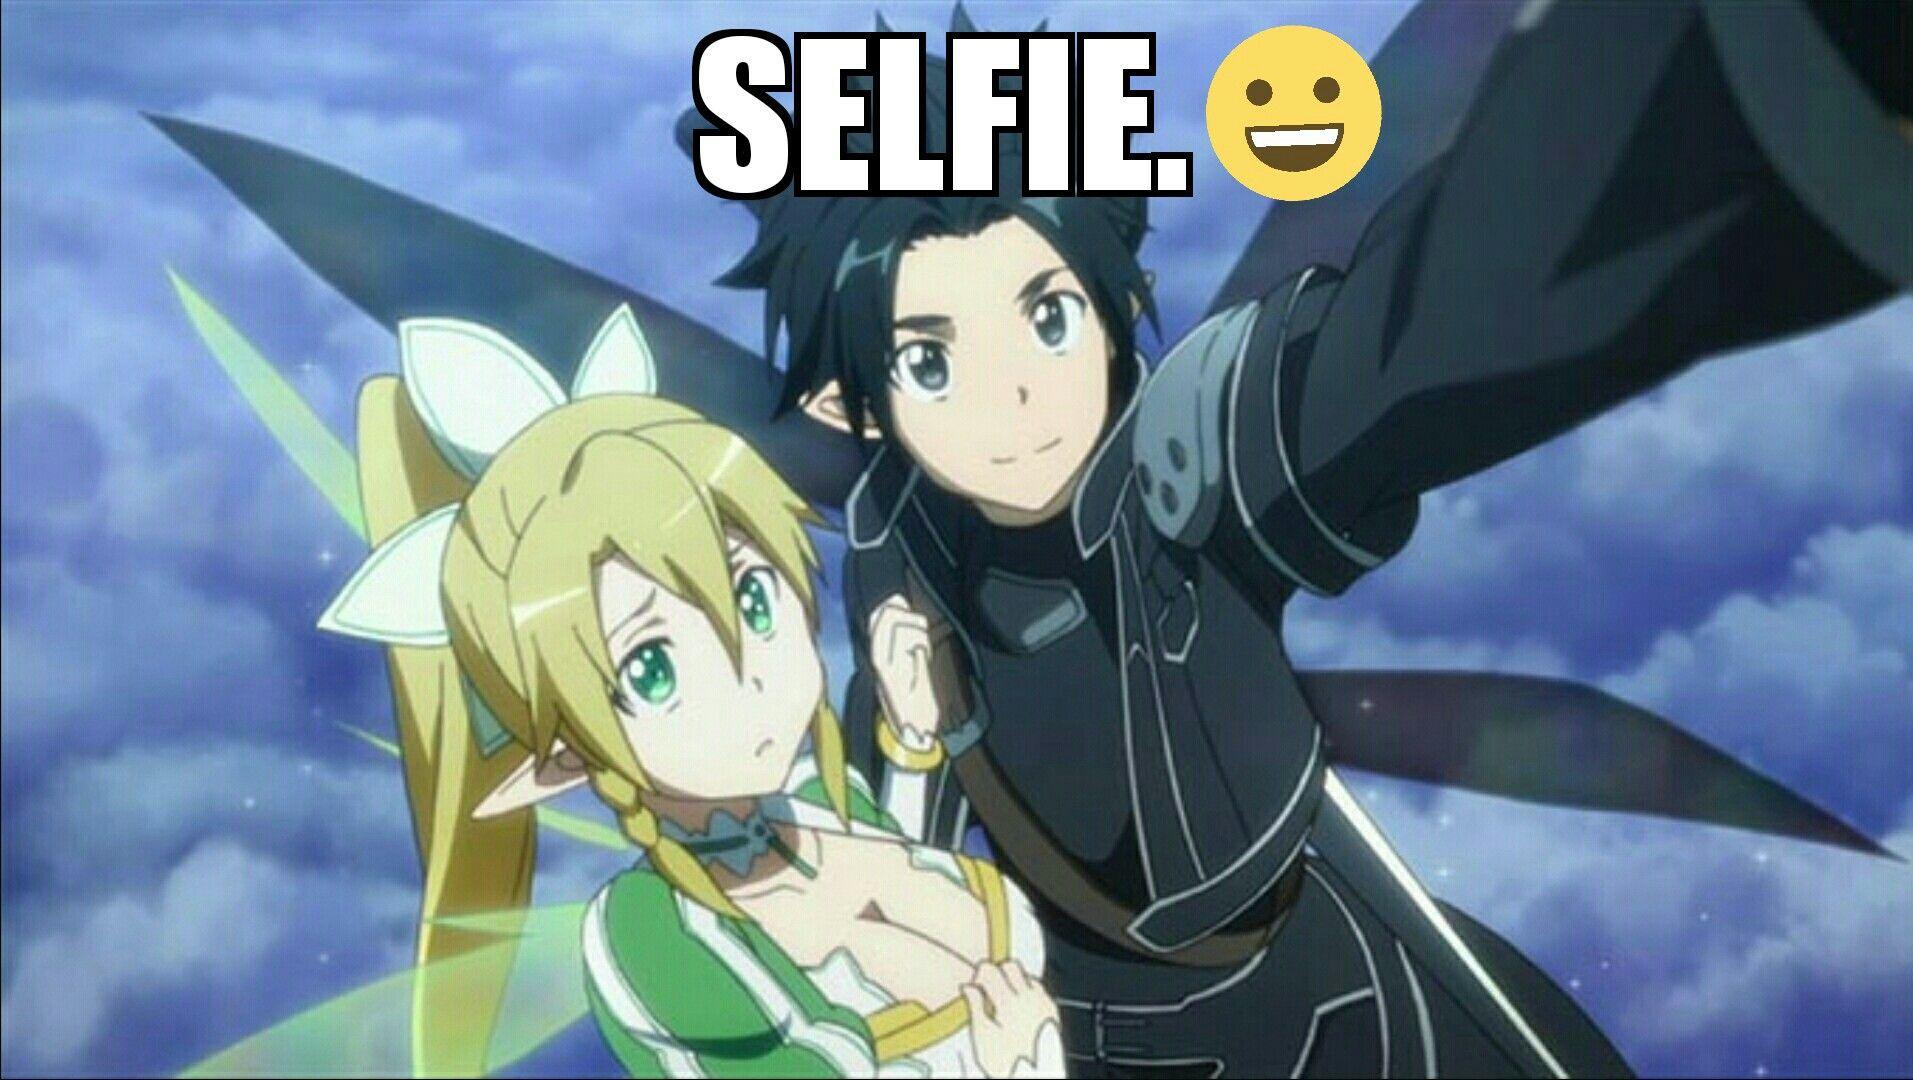 Selfie with Sugu! | Anime, Cómics